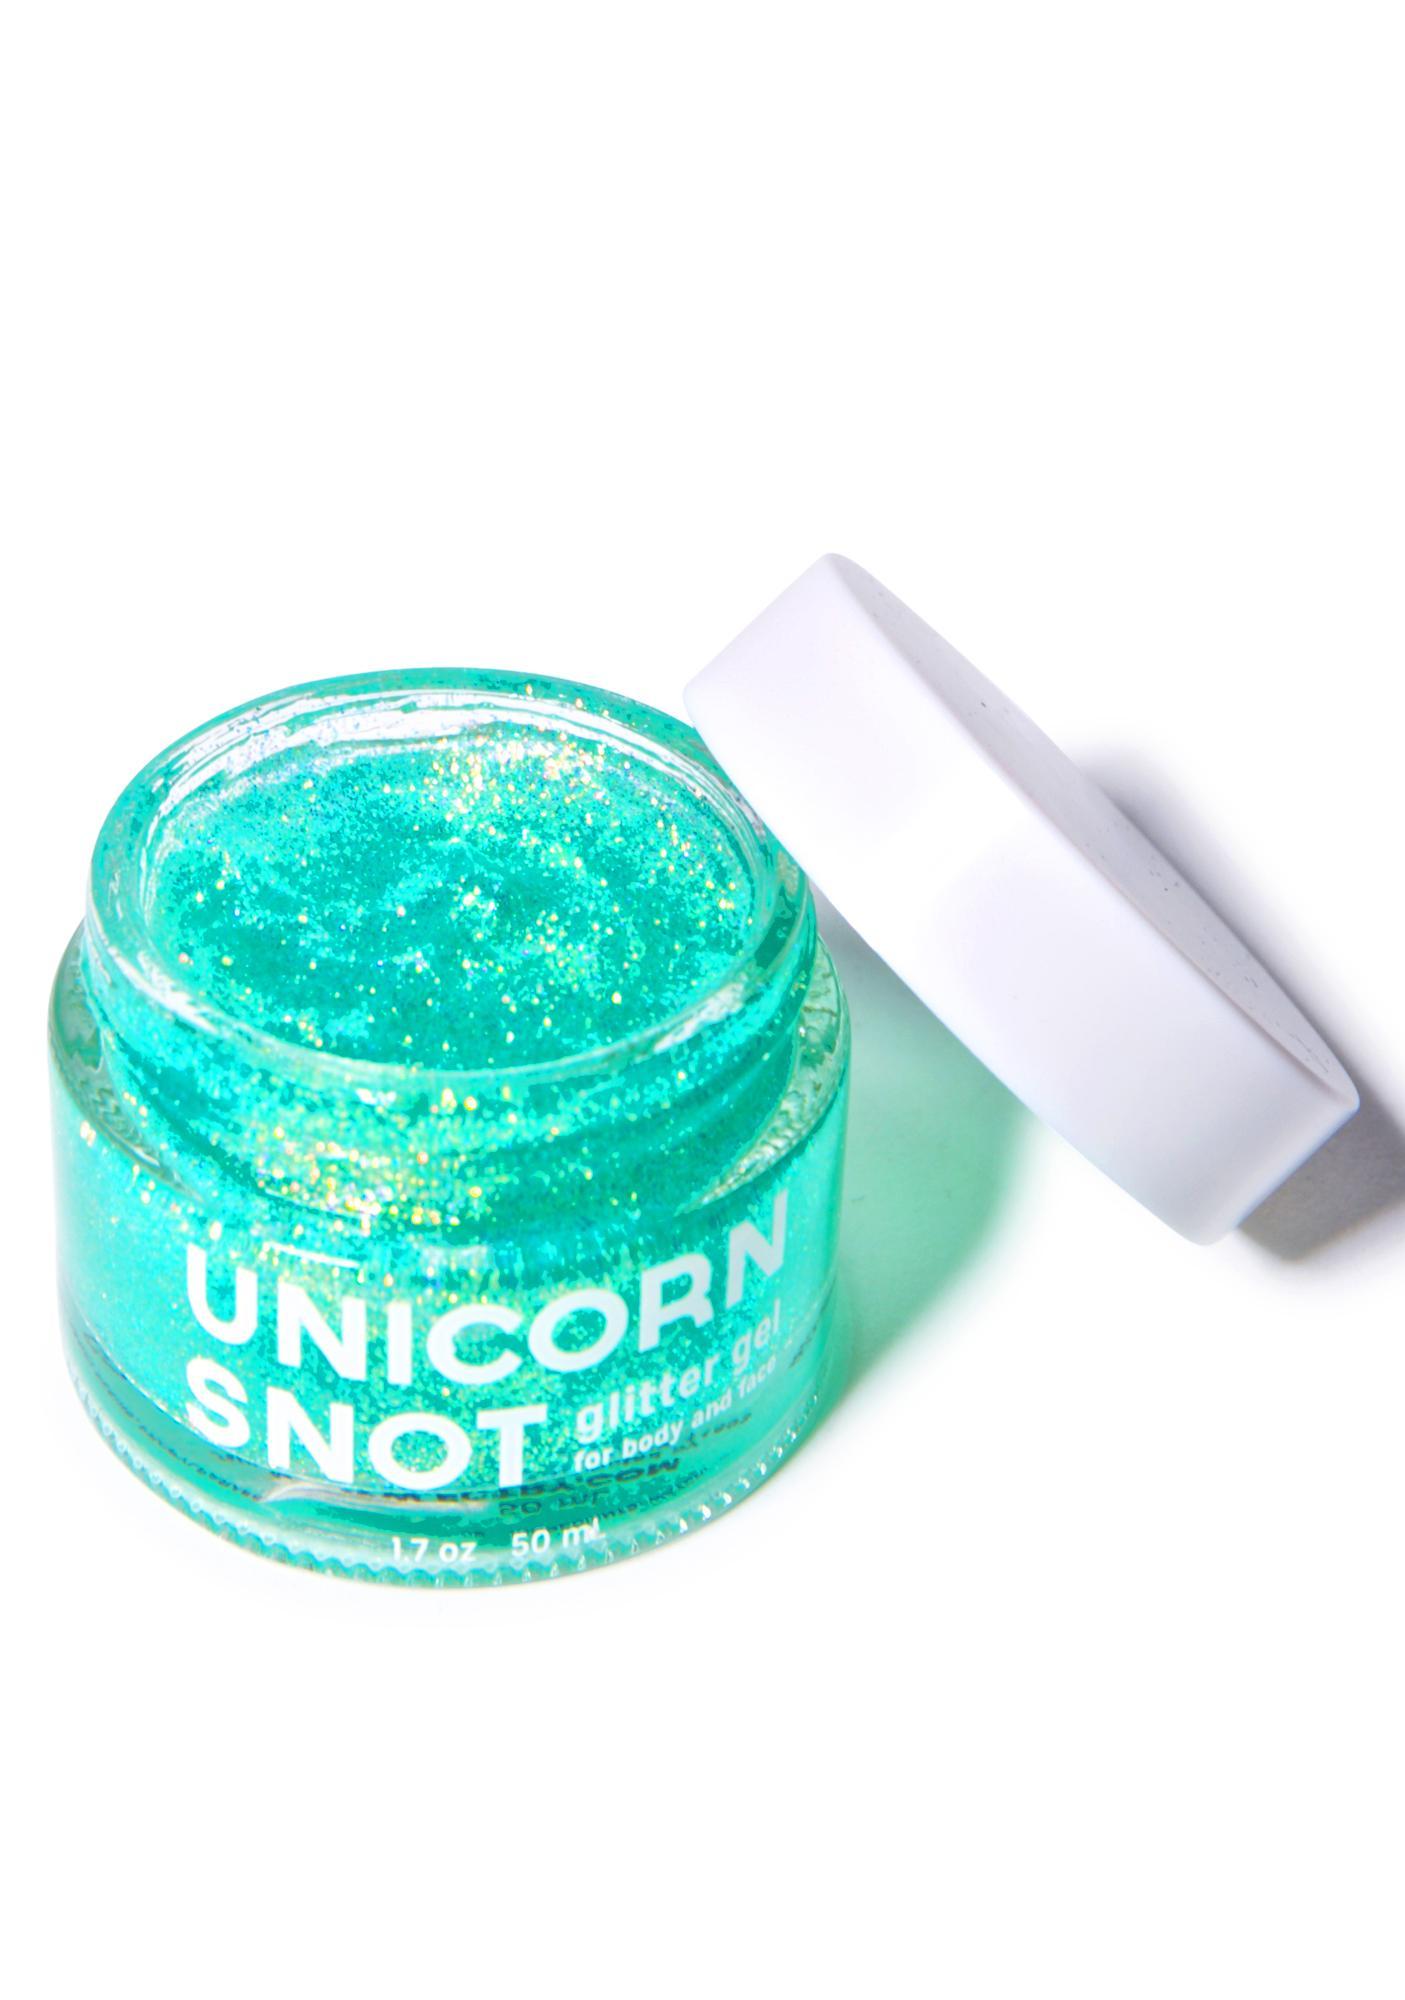 Unicorn Snot Blue Glitter Gel